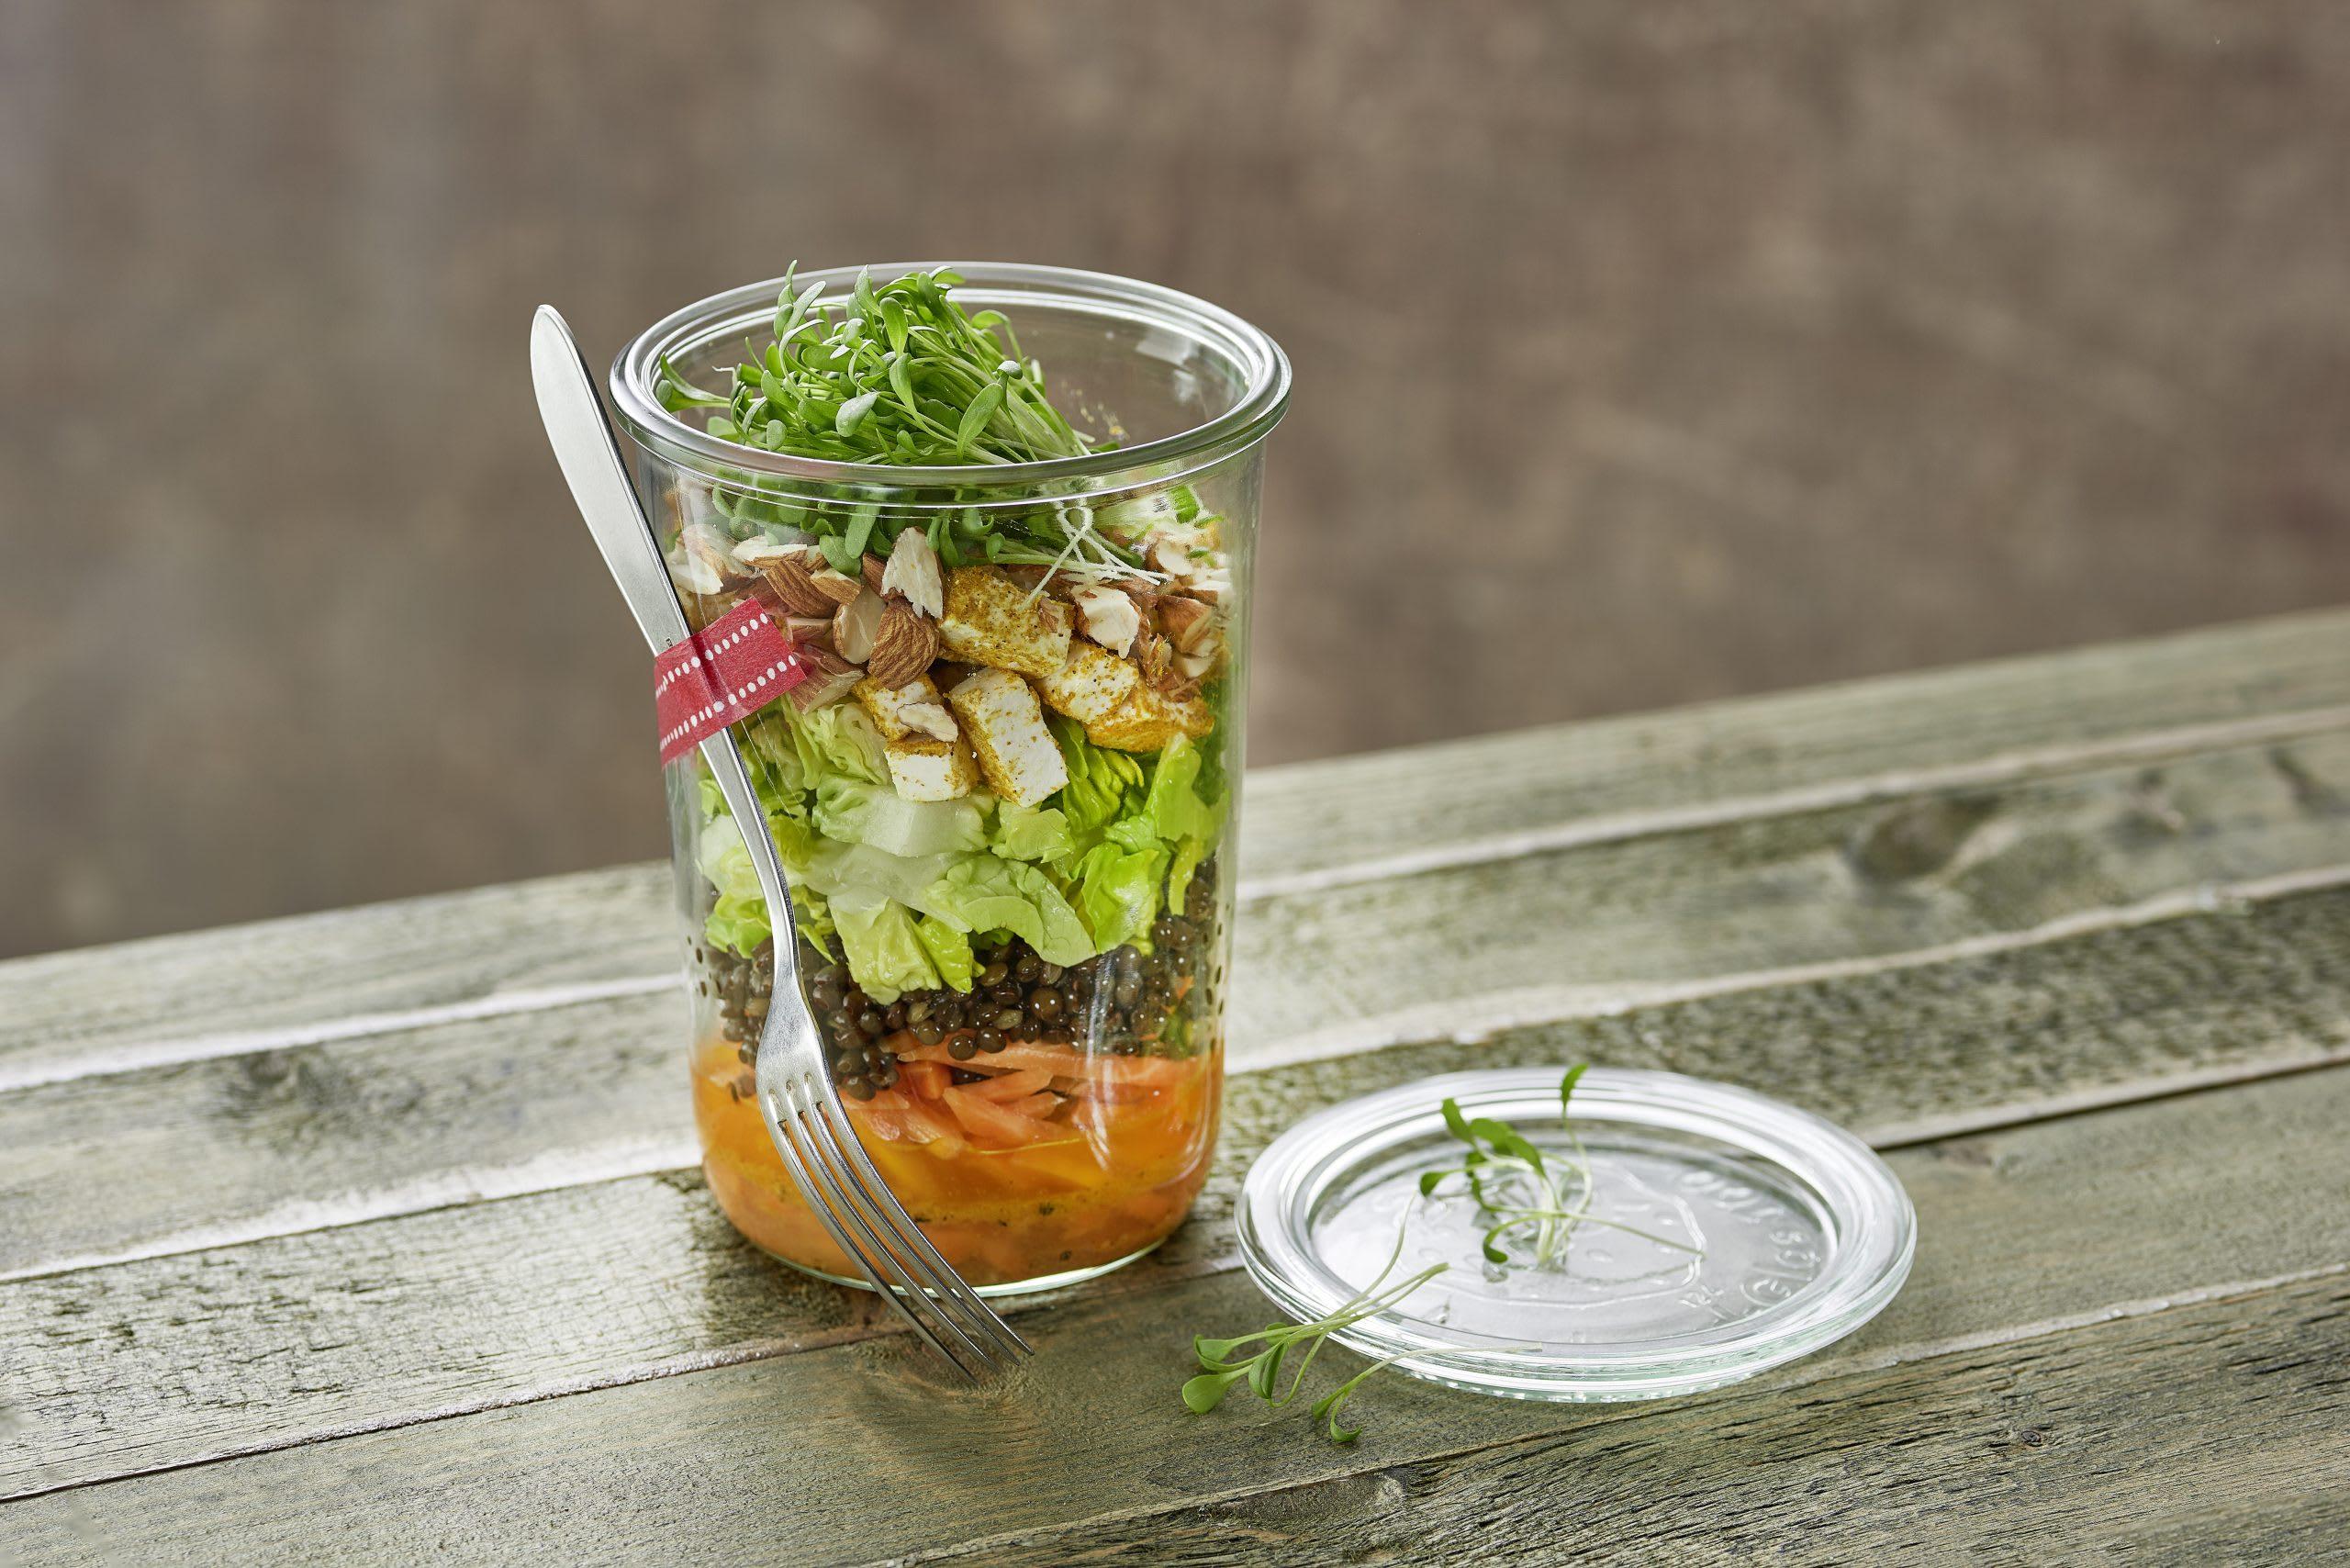 Rüebli-Linsen-Salat im Glas mit Frischkäse